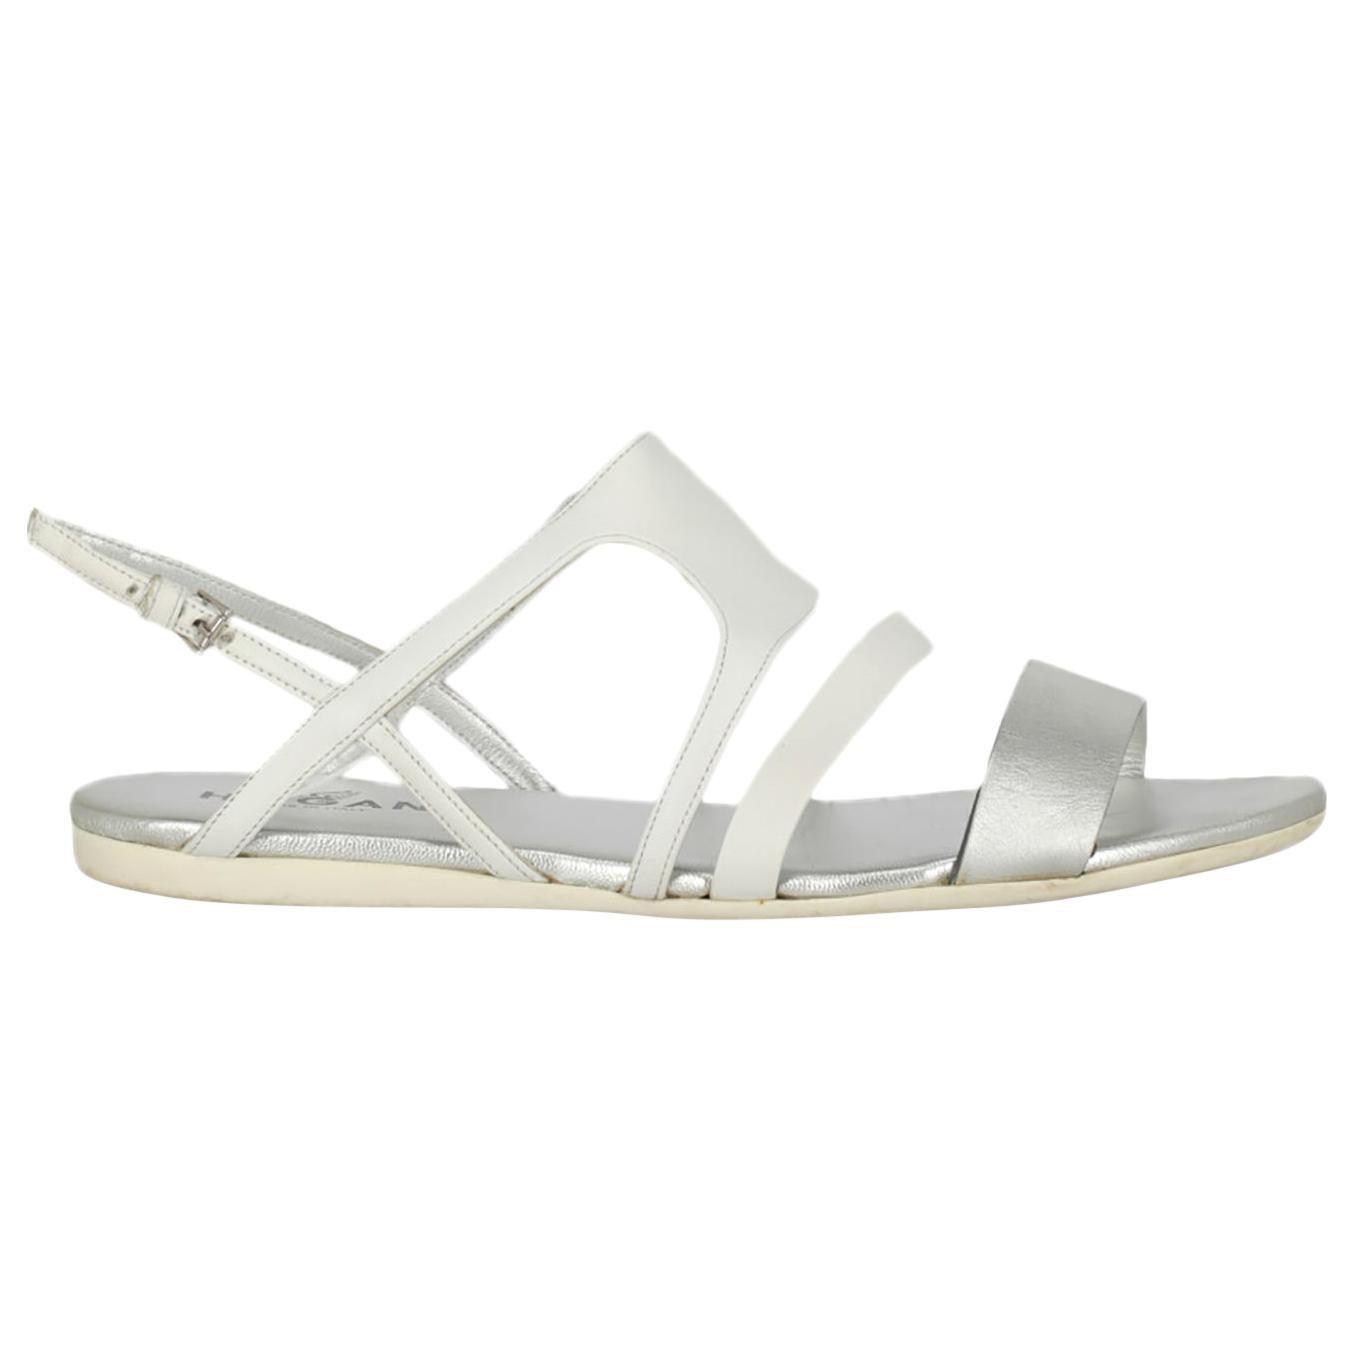 Hogan  Women   Sandals  Silver, White Leather EU 39.5